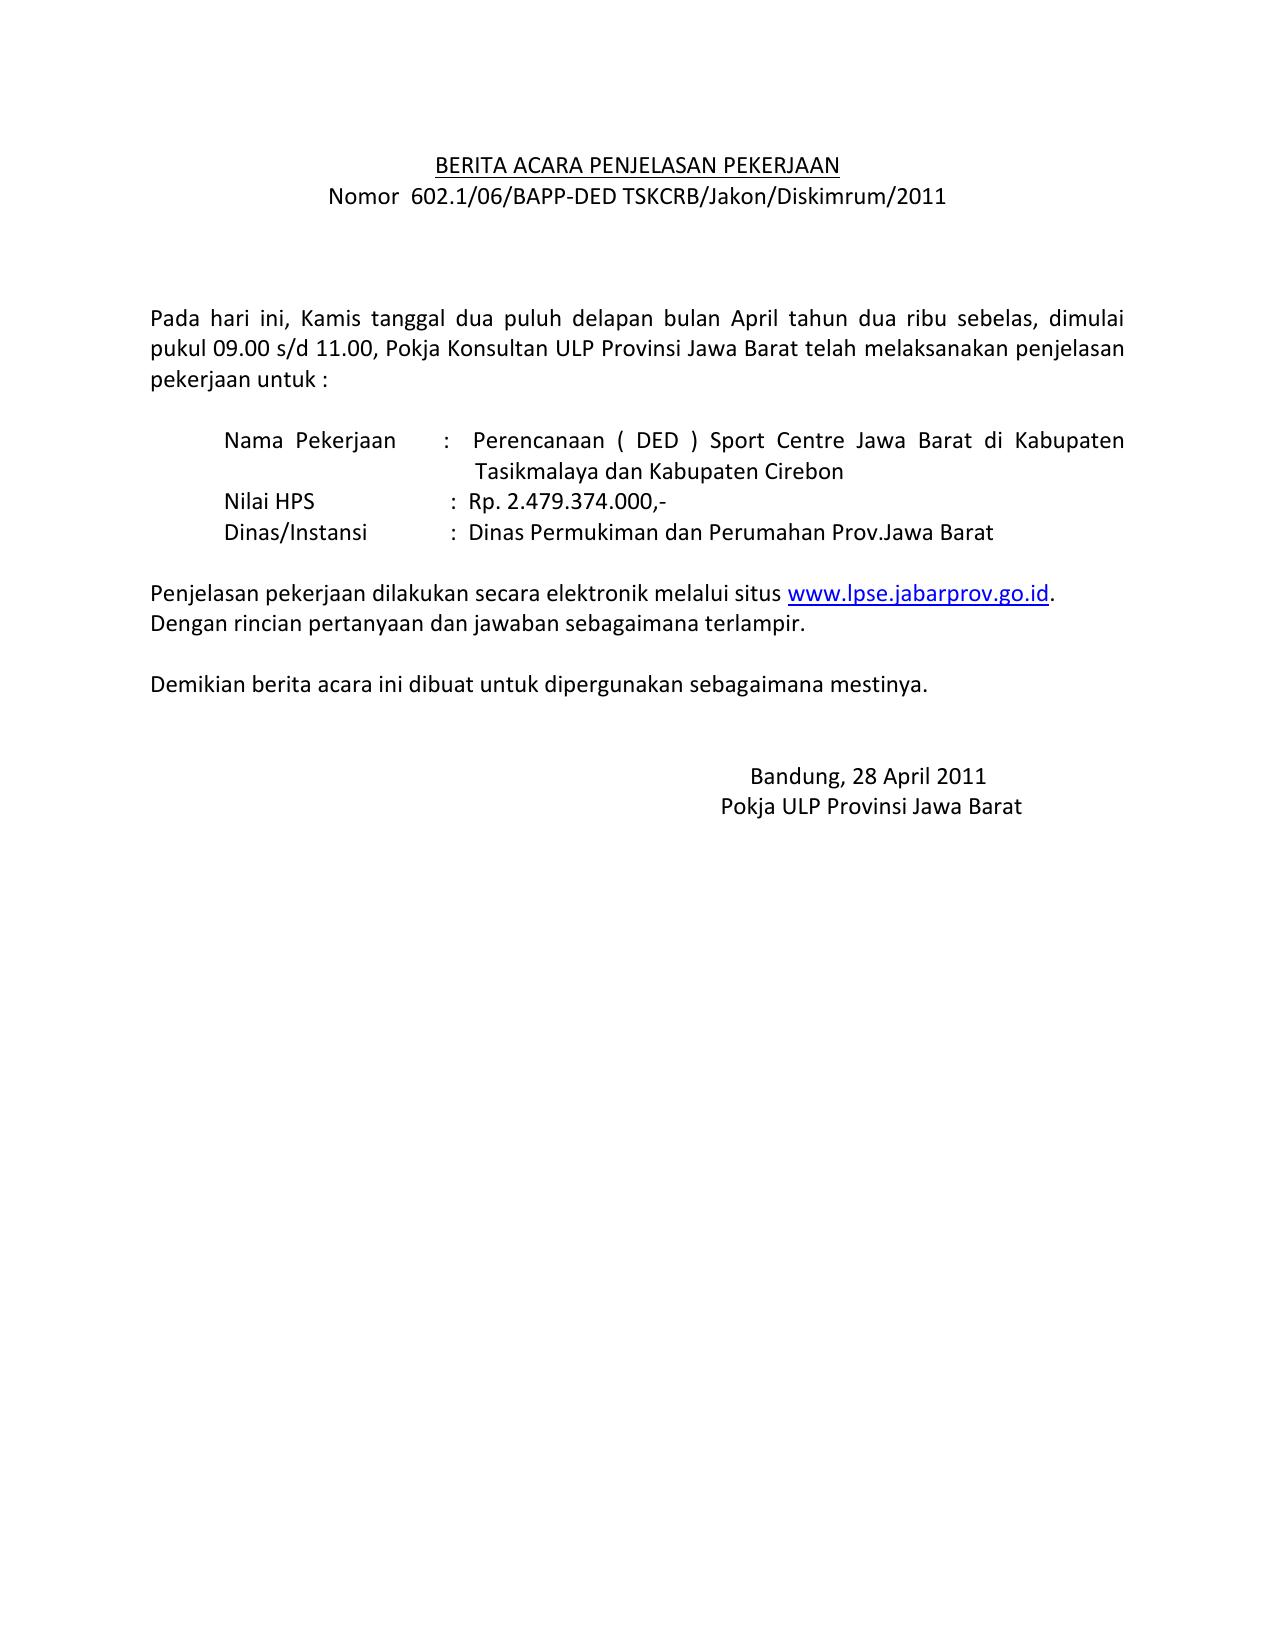 Berita Acara Penjelasan Pekerjaan Nomor 602 1 06 Bapp